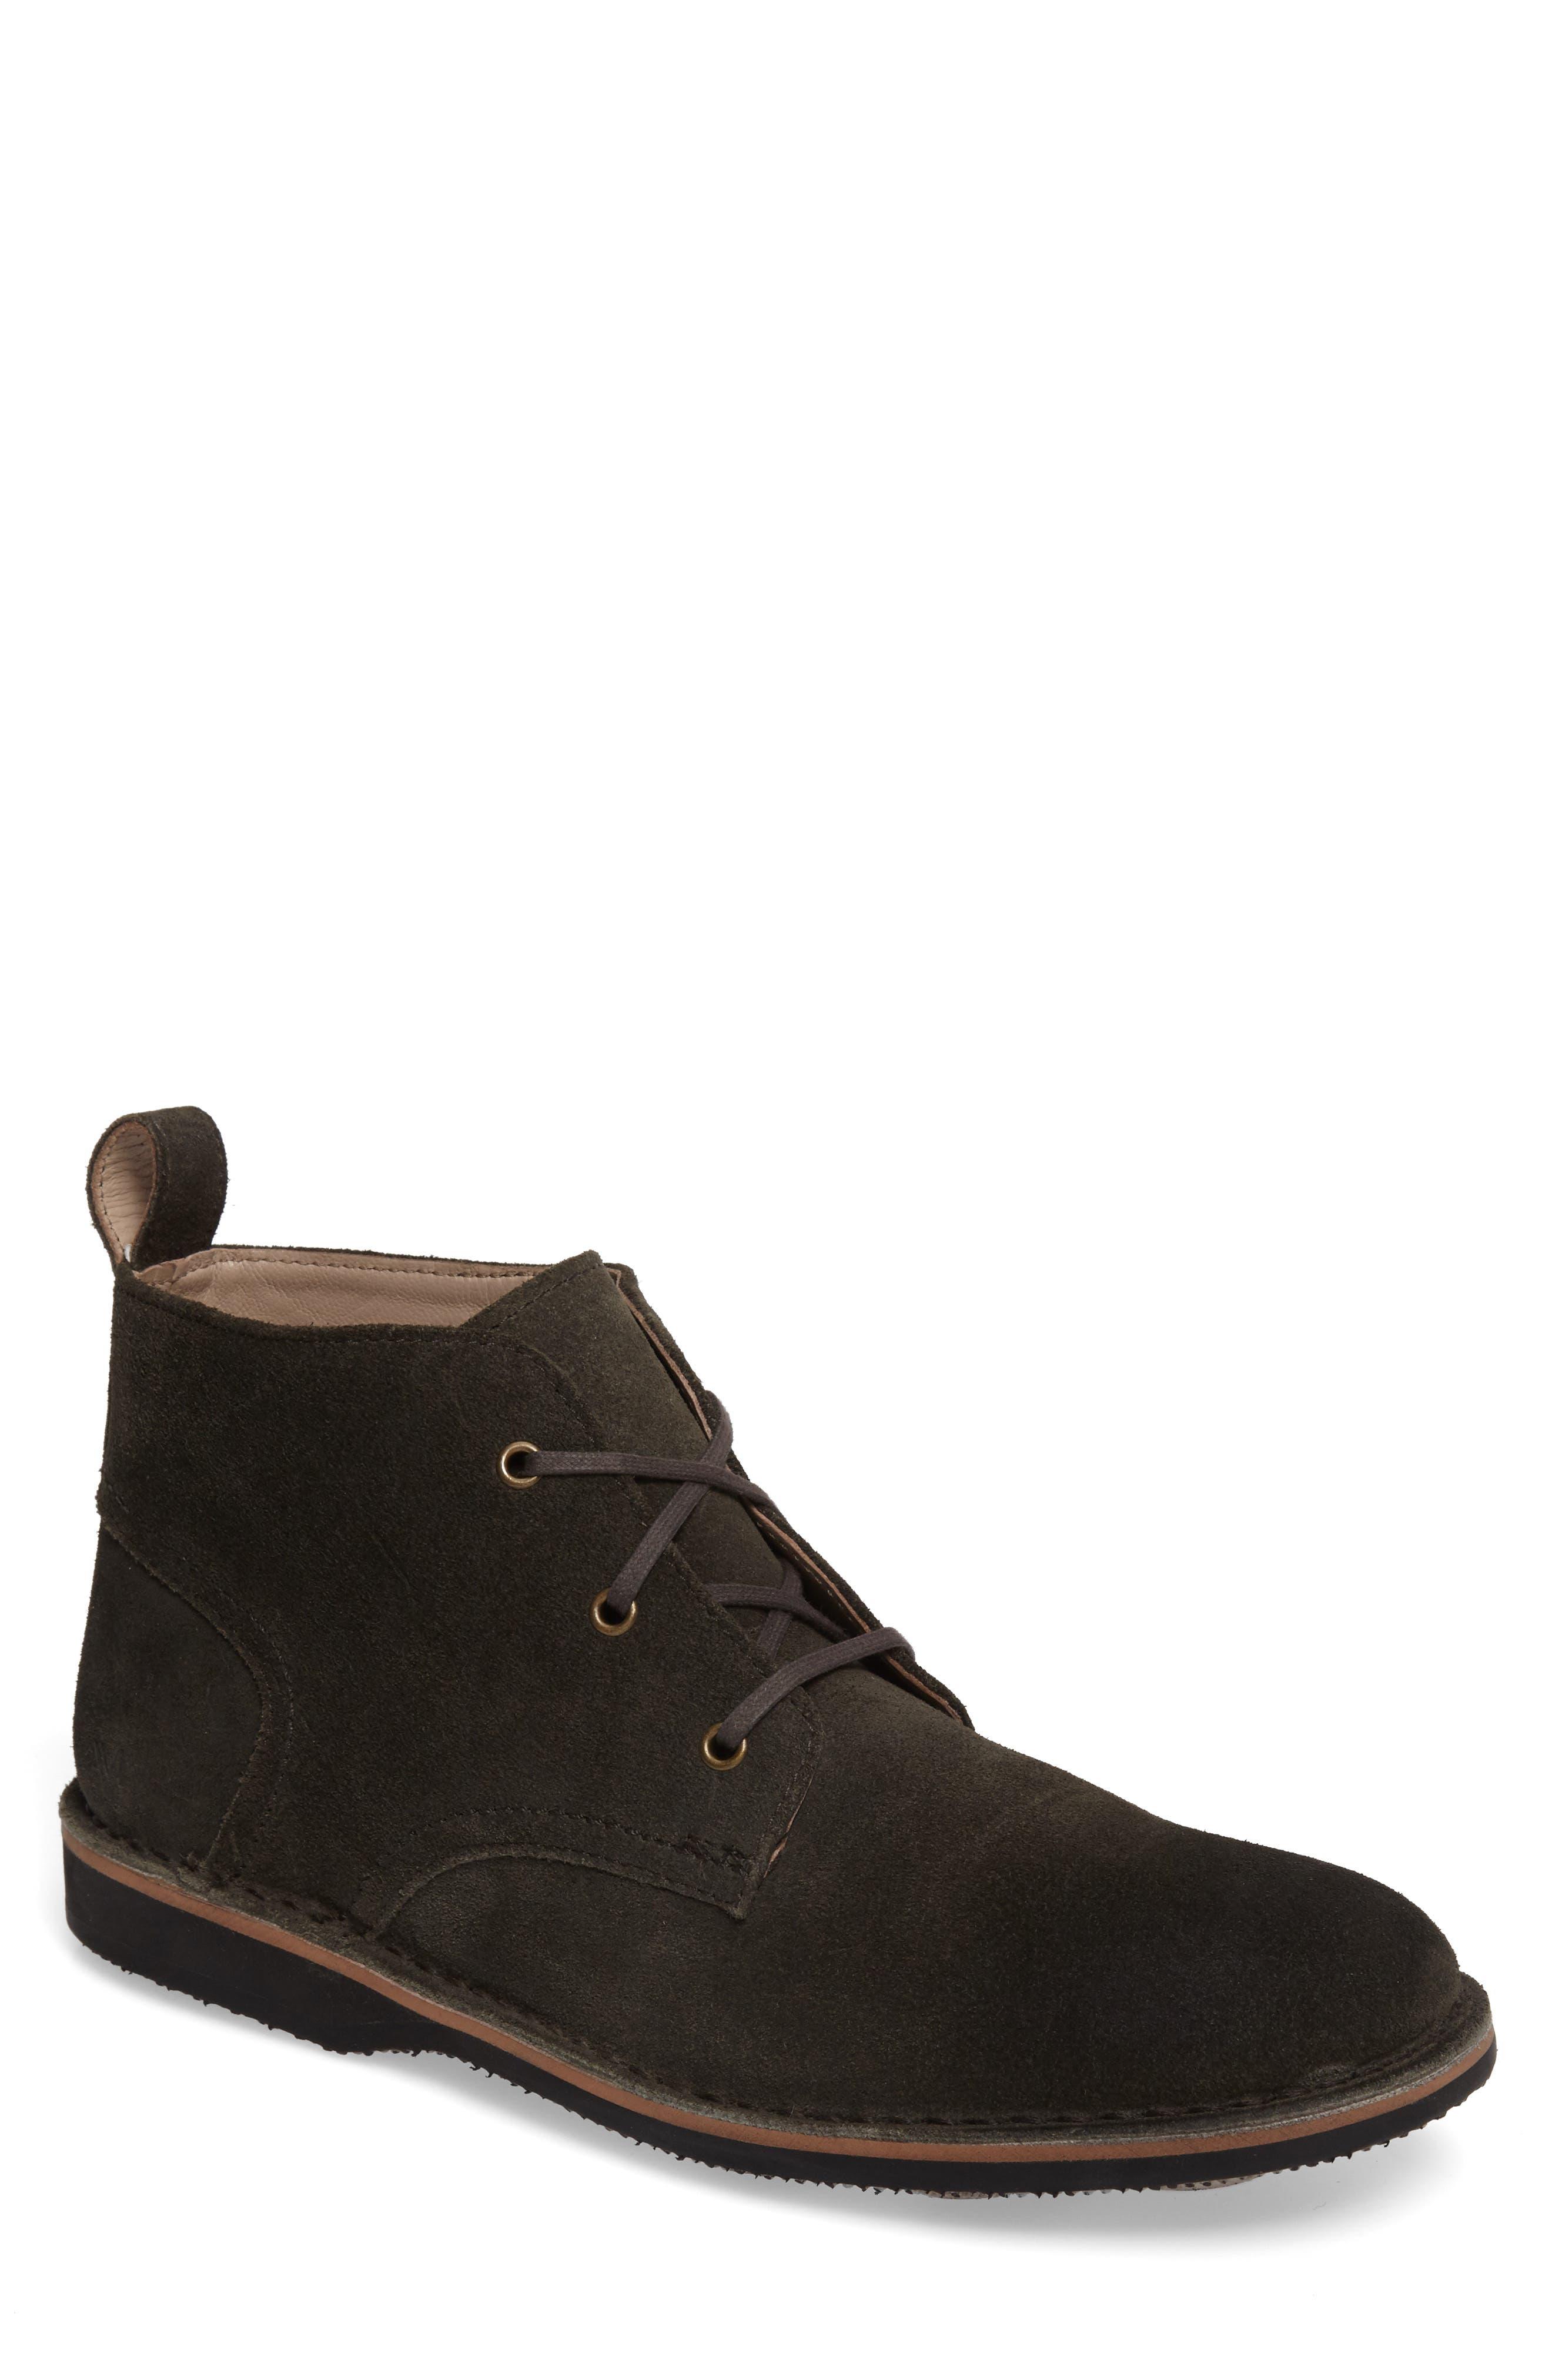 Dorchester Chukka Boot, Main, color, 088